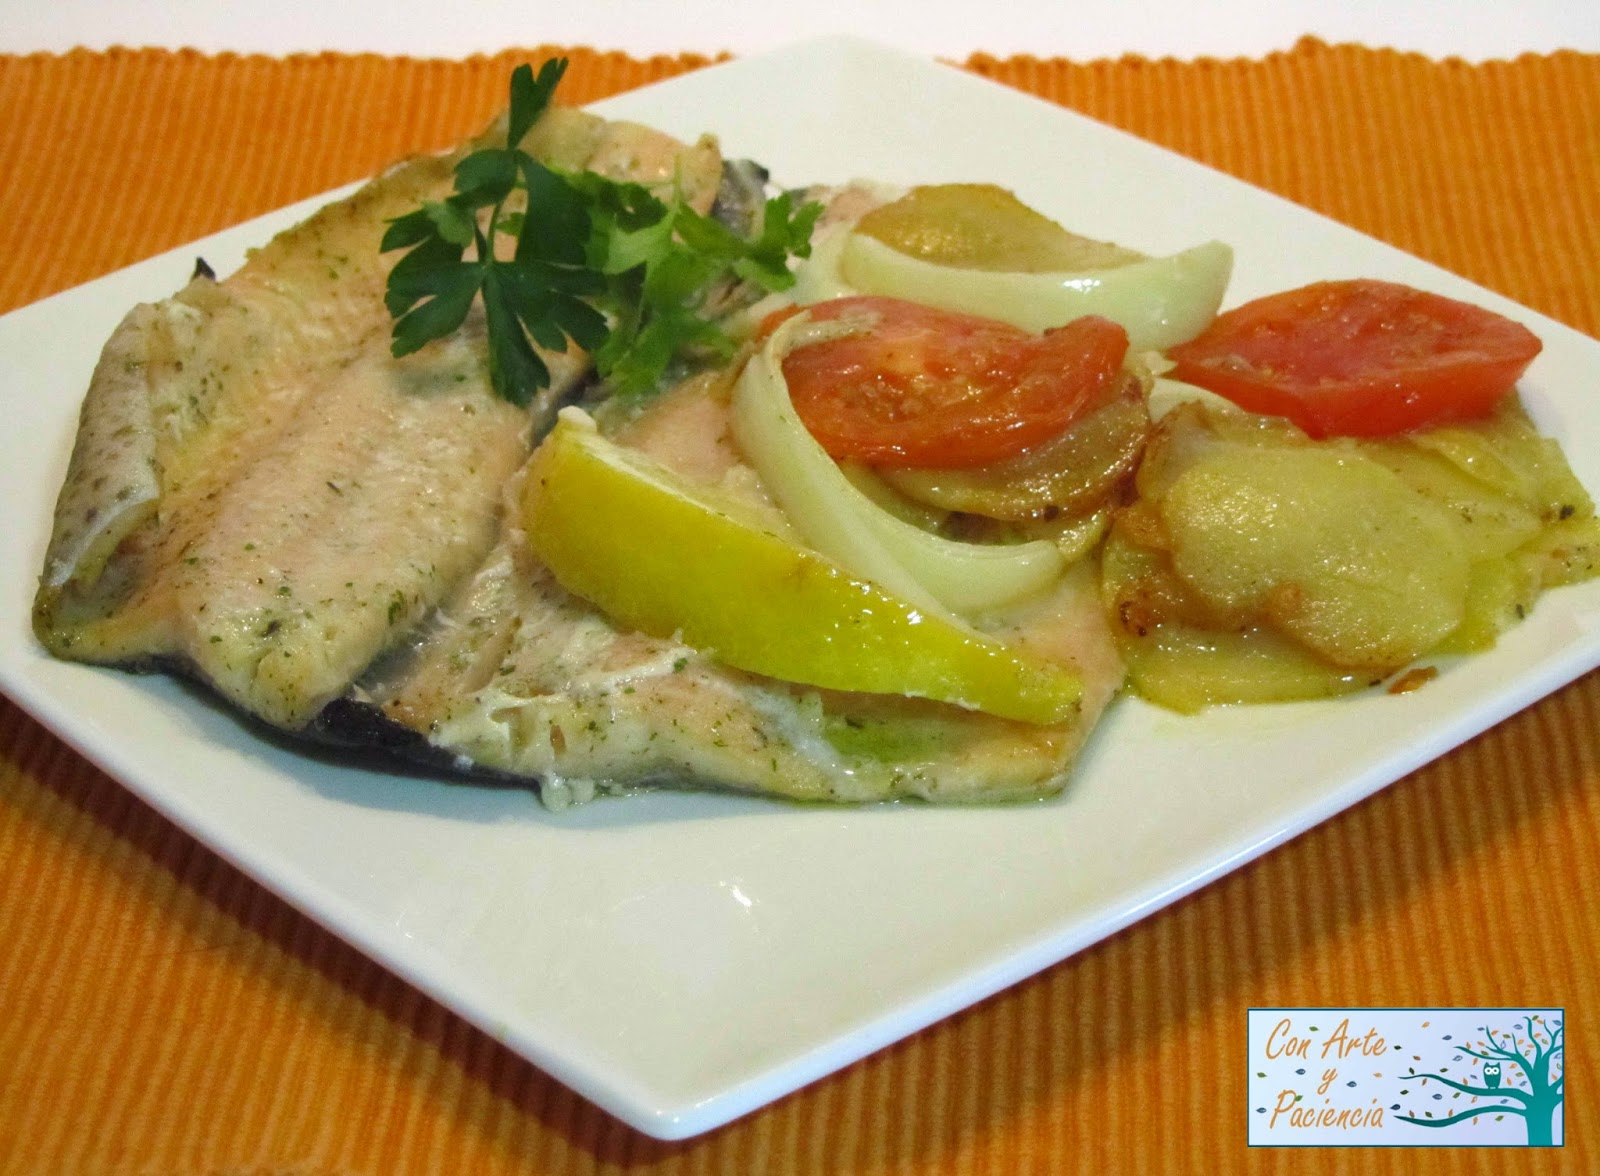 trucha,horno,tomate,cebolla,ajo,receta,mediterranea,economica,limon,patatas,baratas